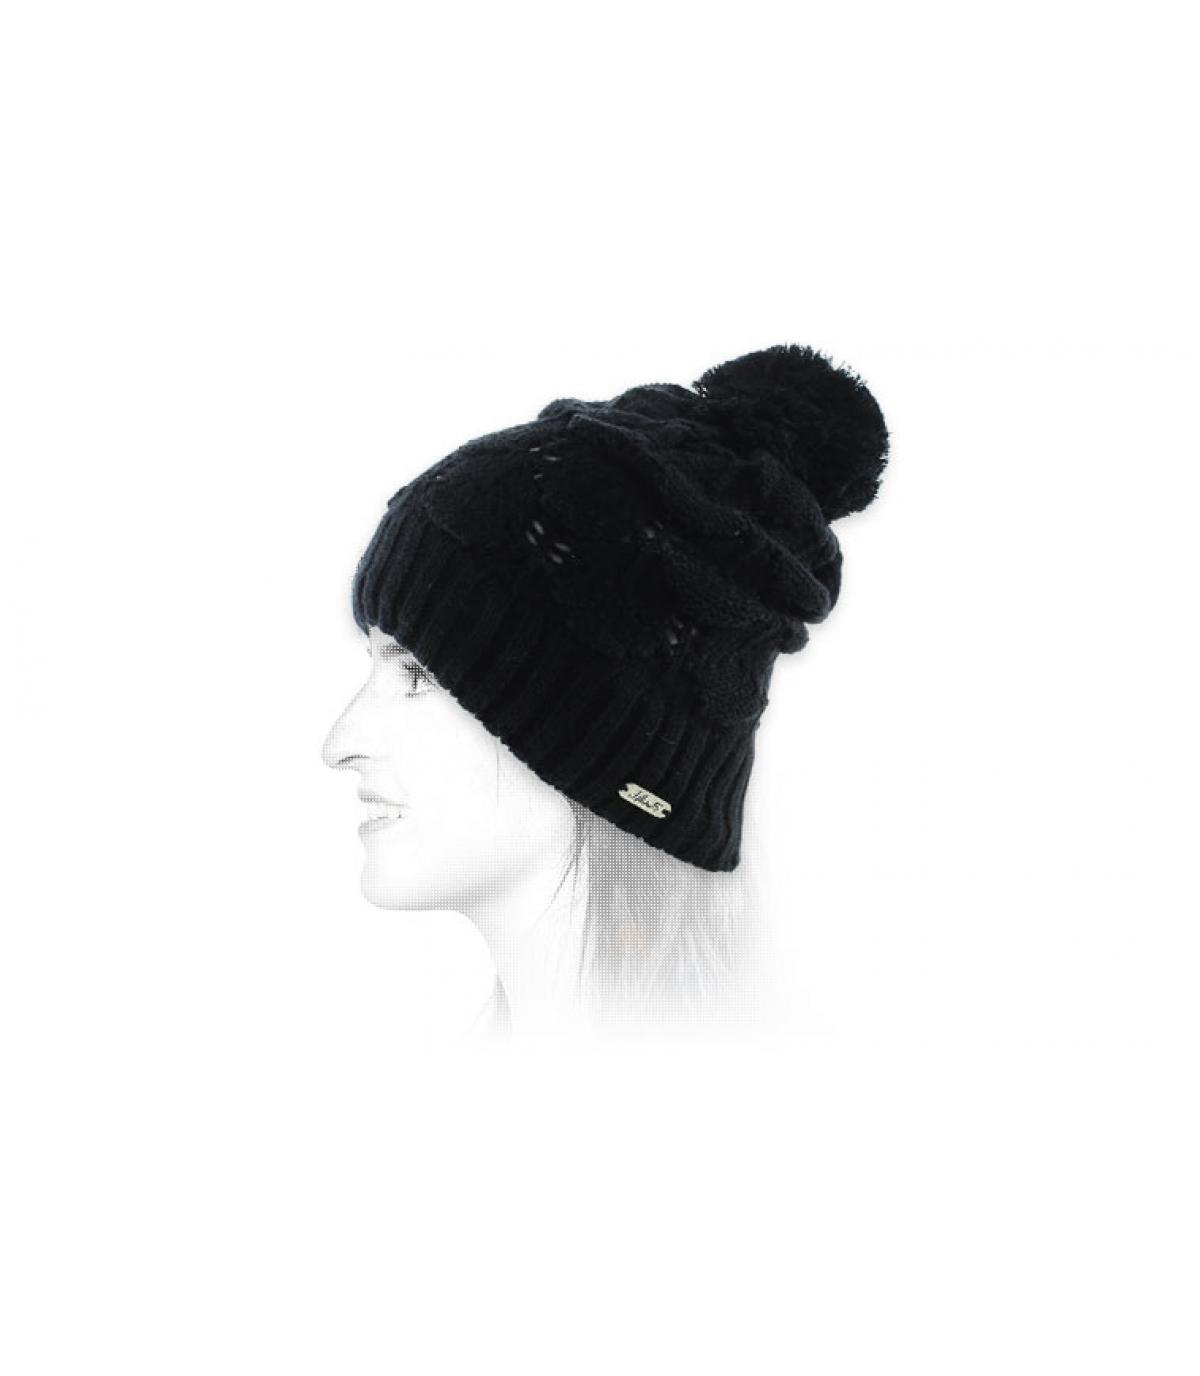 zwarte kwast cap Chillouts